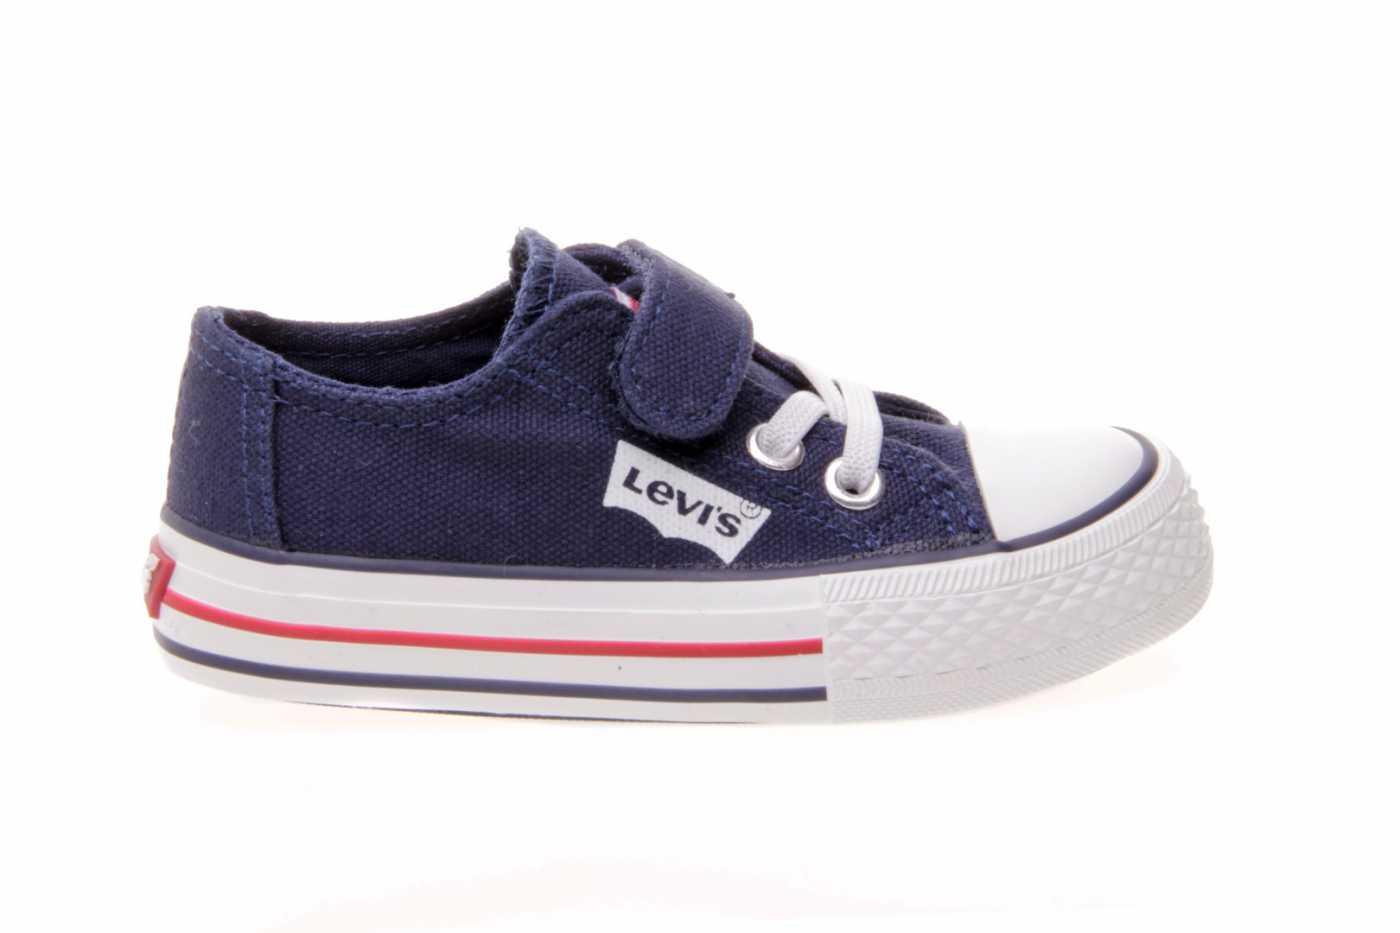 46e37c3bc Comprar zapato tipo JOVEN NIÑO estilo LONA COLOR AZUL MARINO LONA ...